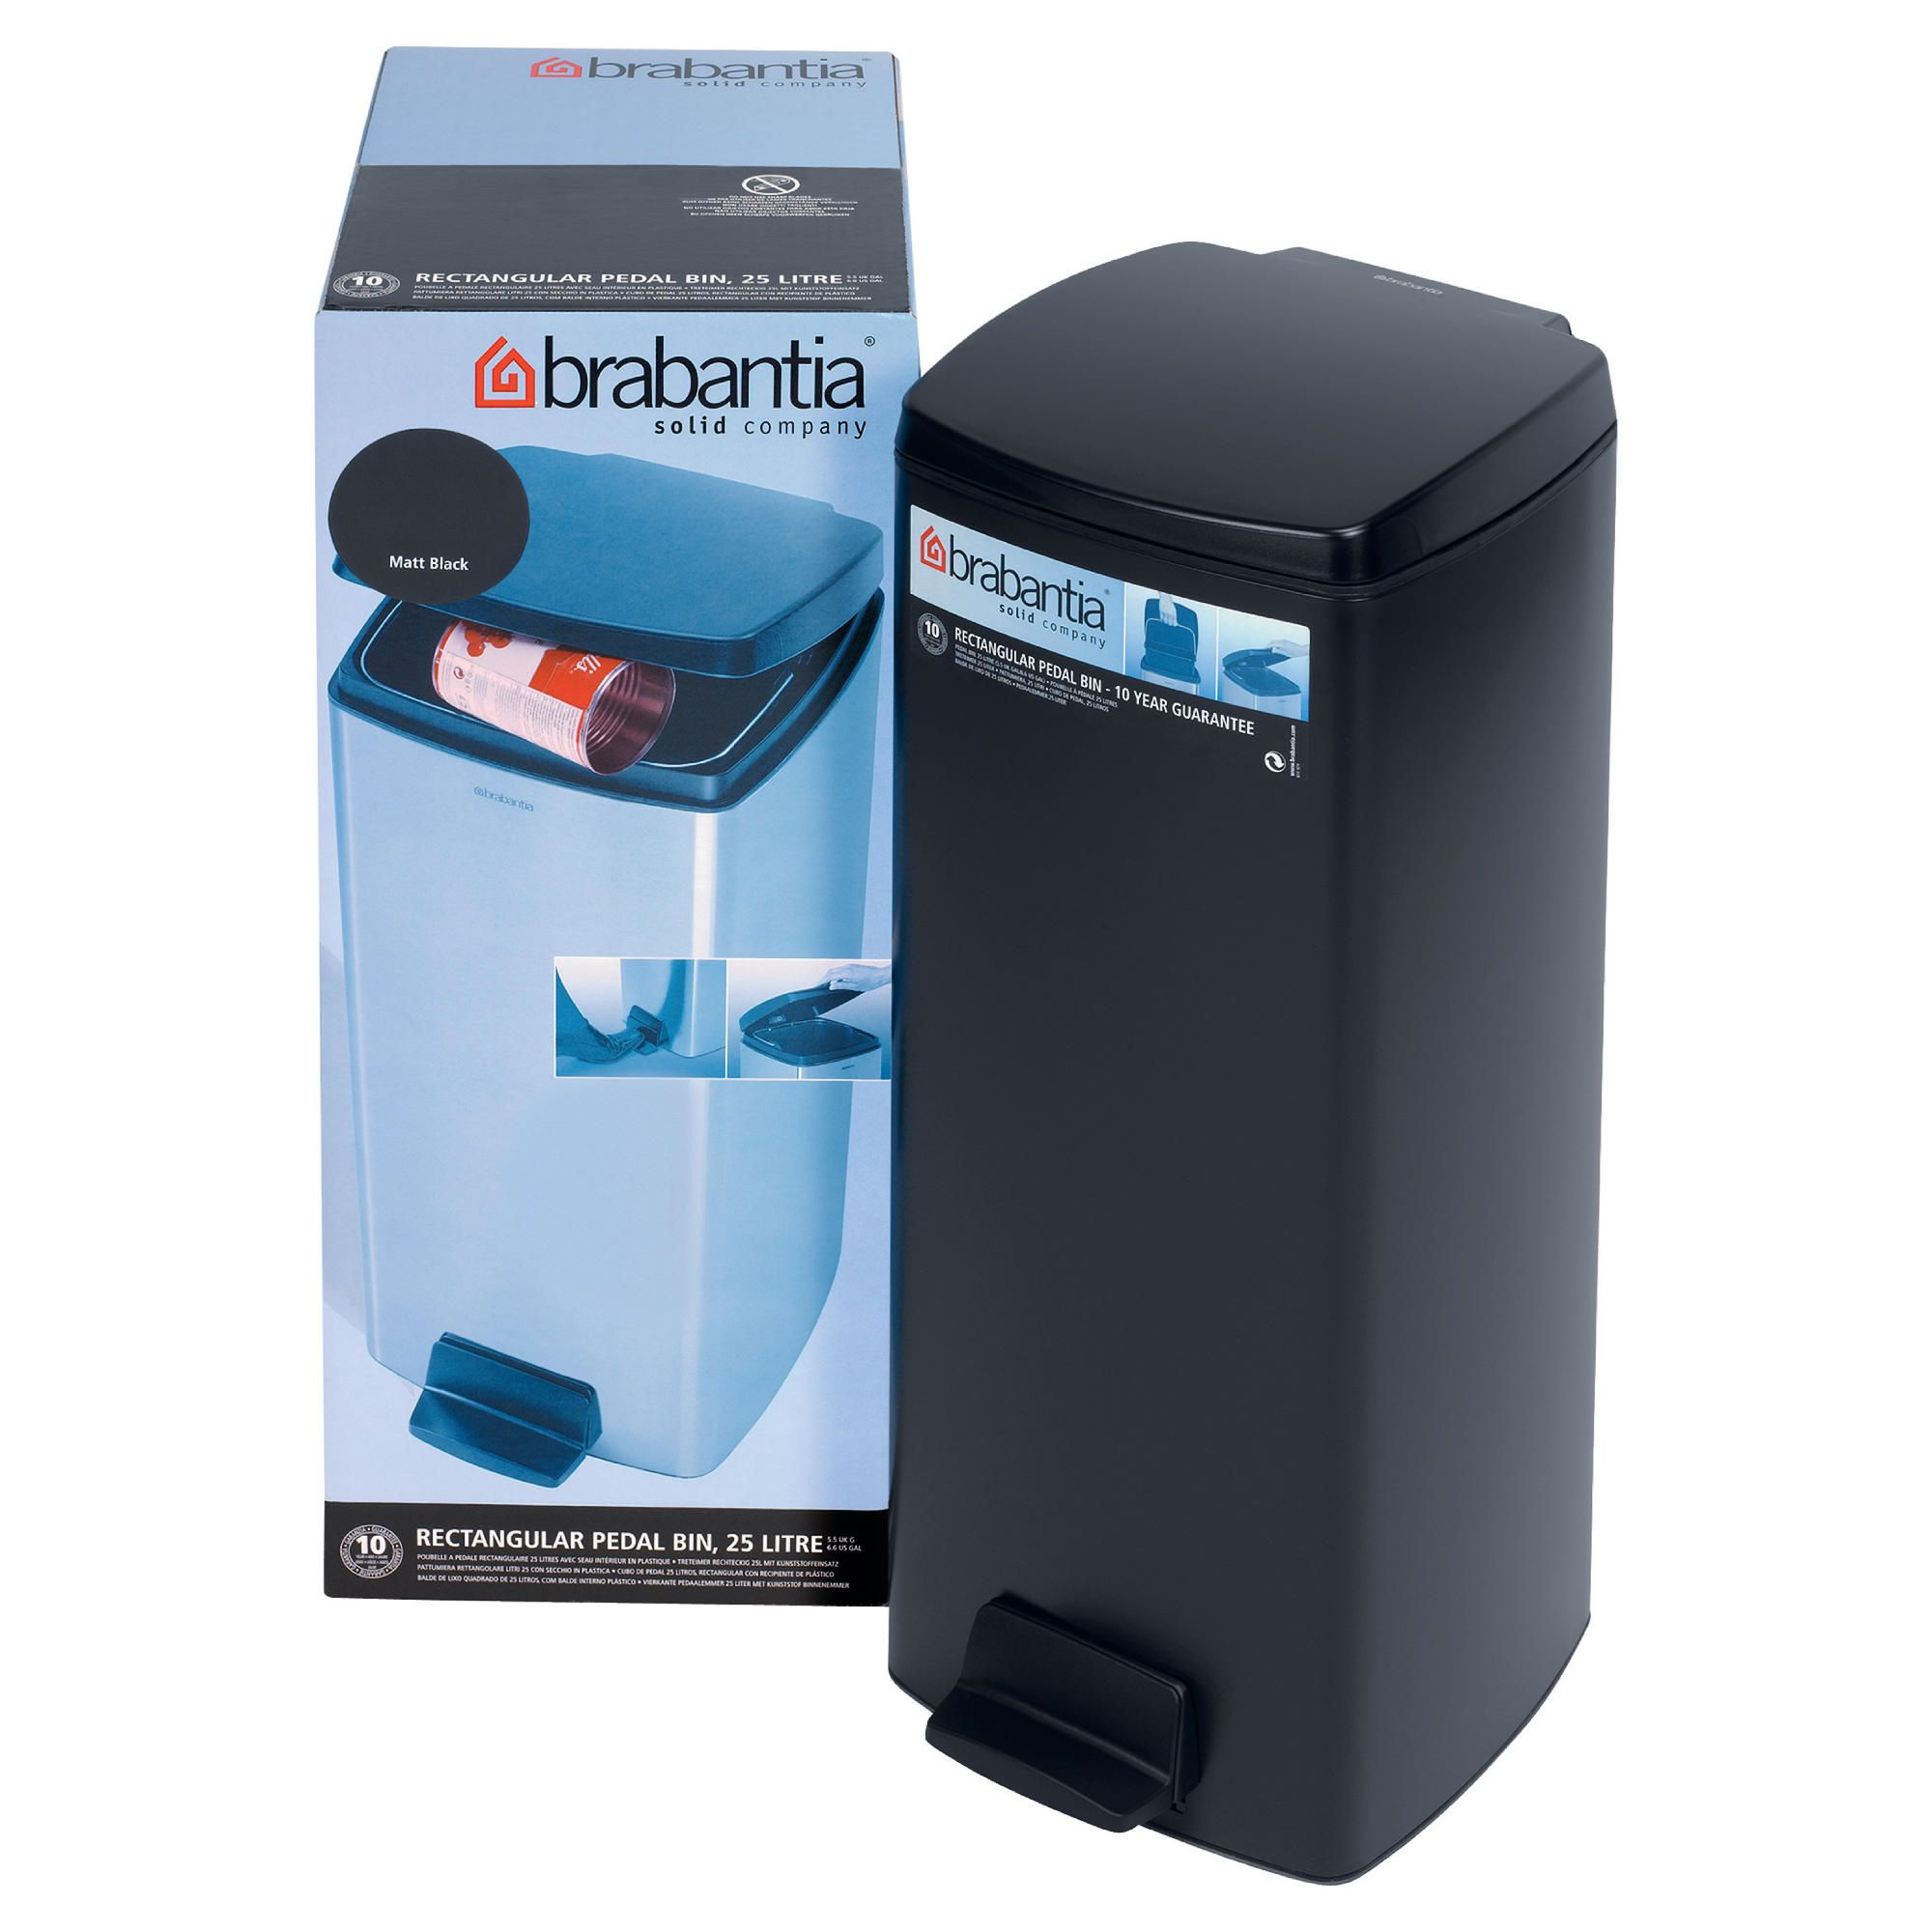 brabantia 15 litre built in kitchen bin with inner plastic waste 2015 home design ideas. Black Bedroom Furniture Sets. Home Design Ideas